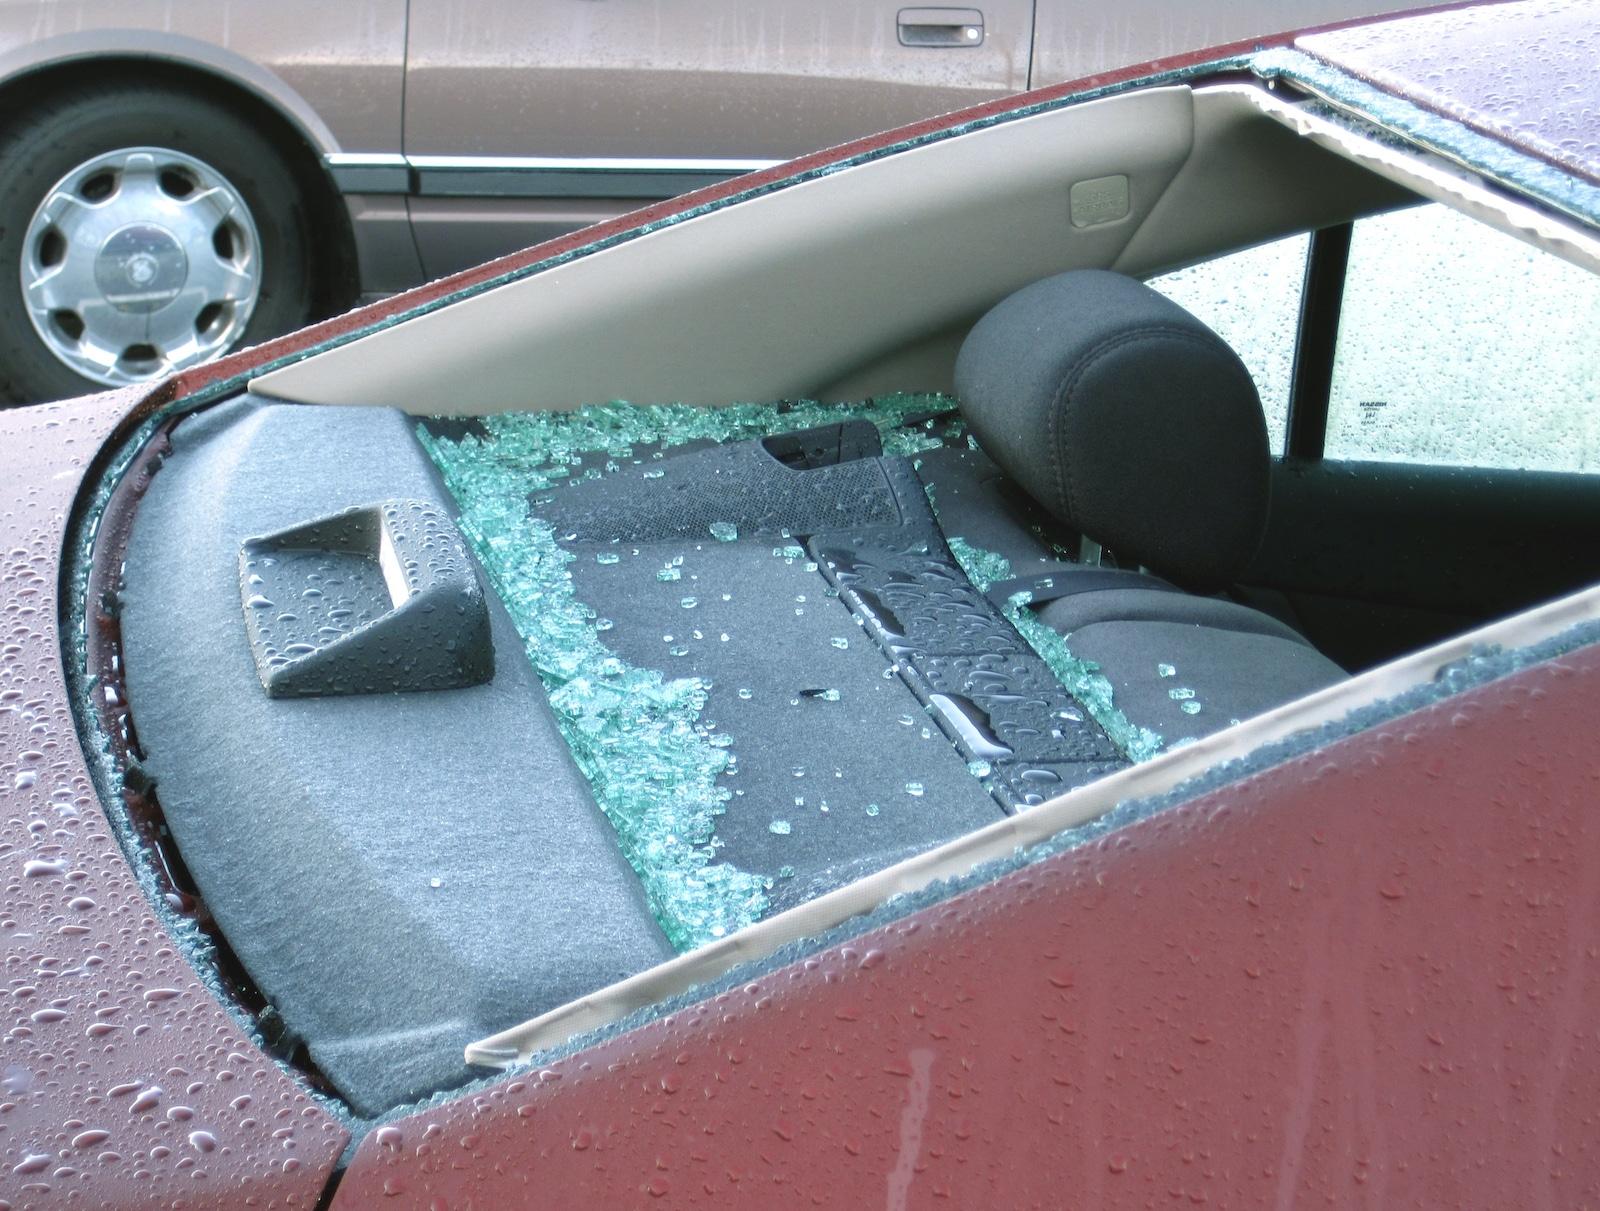 Hailstorm Limon Colorado Broken Windshield